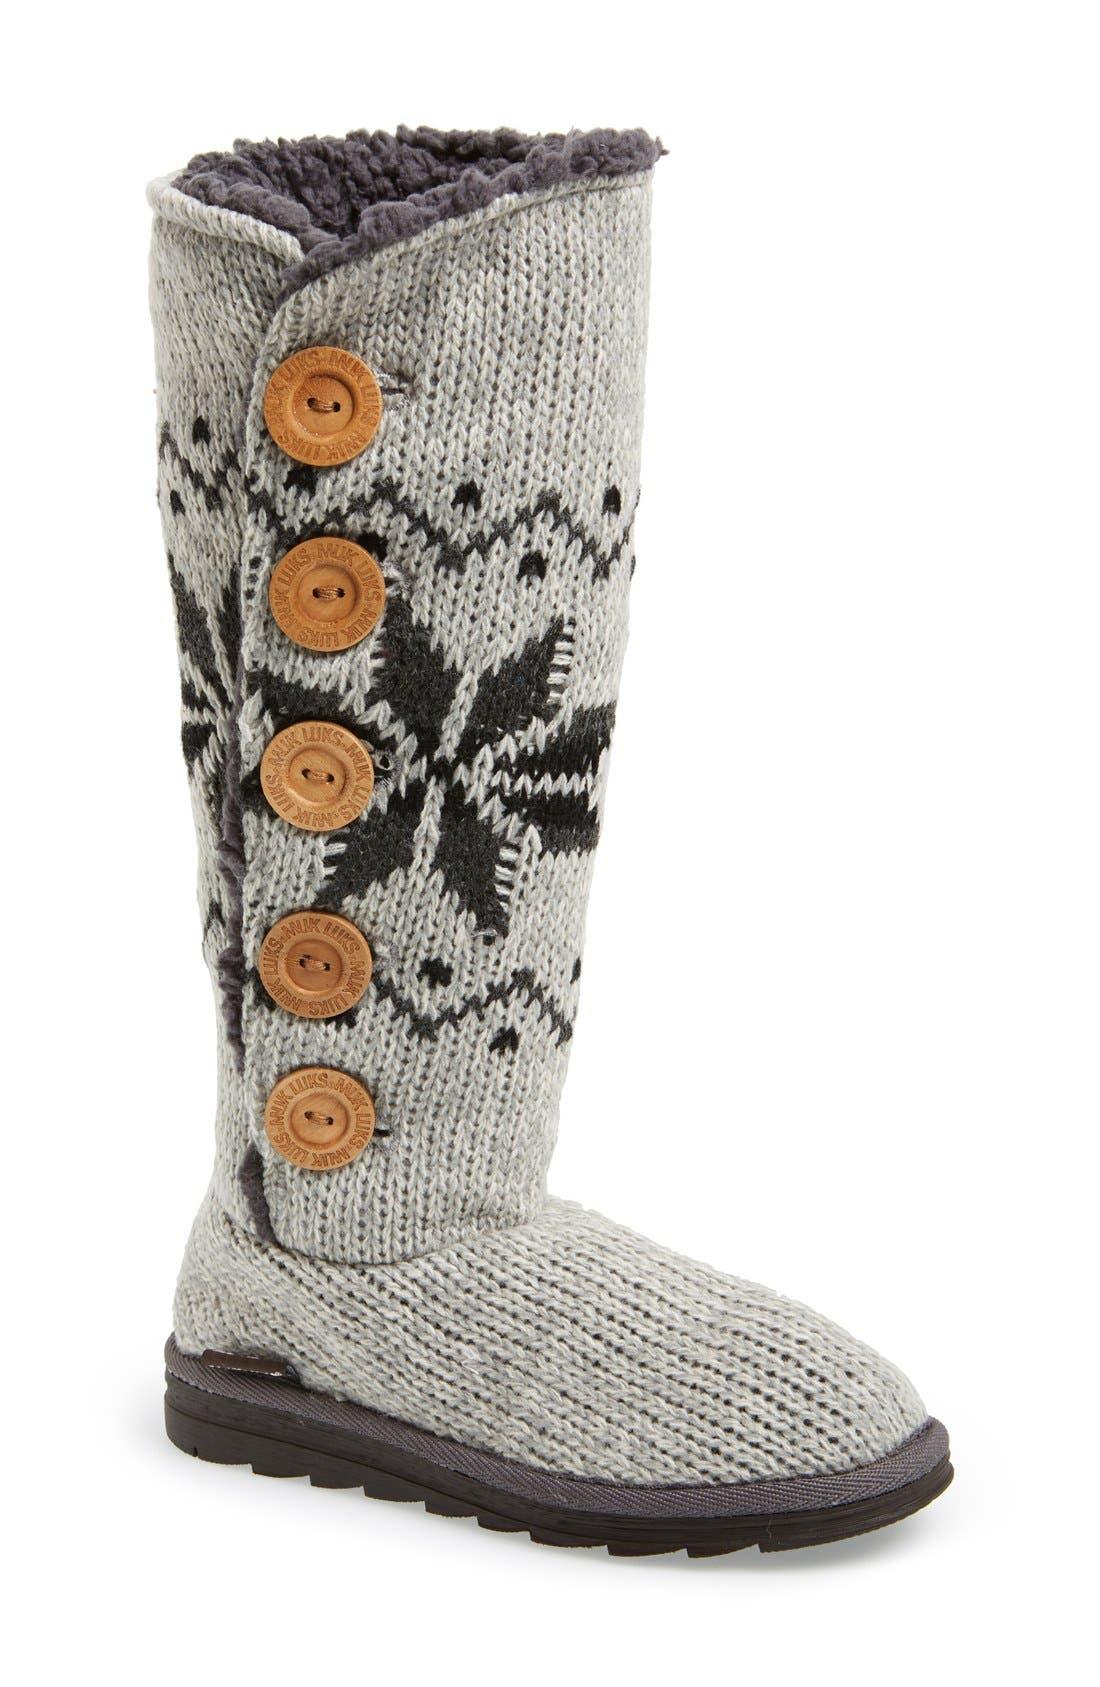 Alternate Image 1 Selected - MUK LUKS 'Malena' Button Up Crochet Boot (Women)